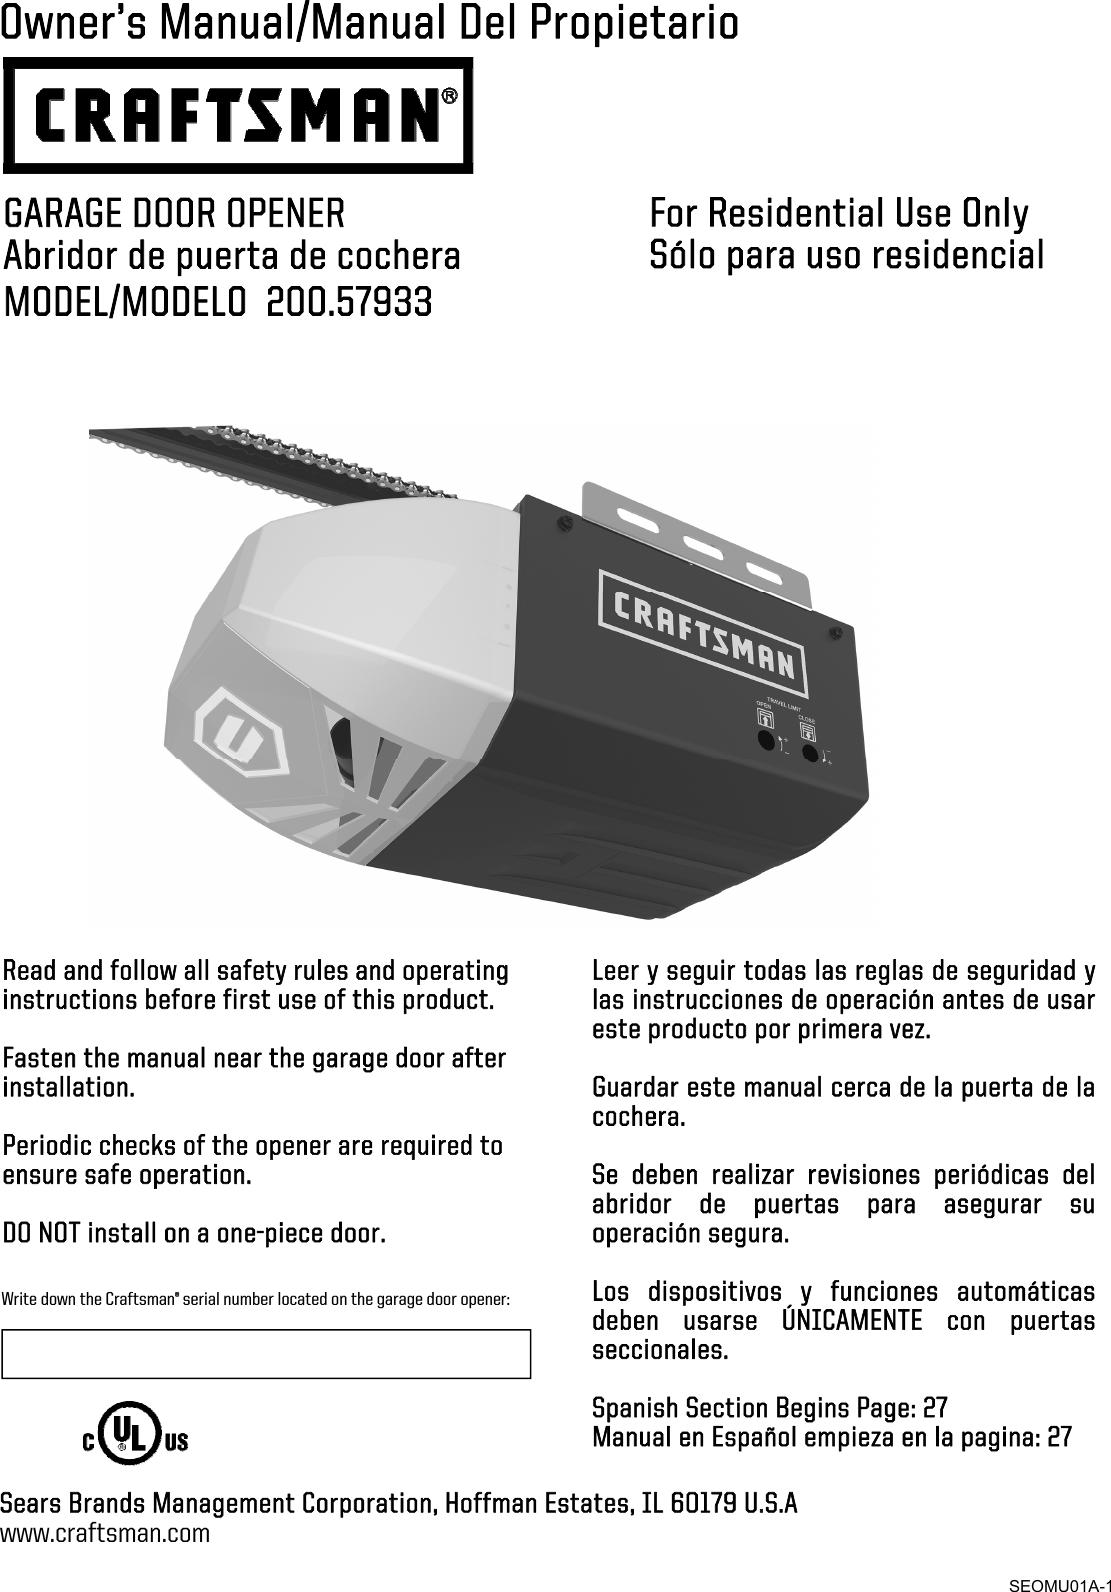 Craftsman 20057933 Sears20170406 User Manual GARAGE DOOR ... on